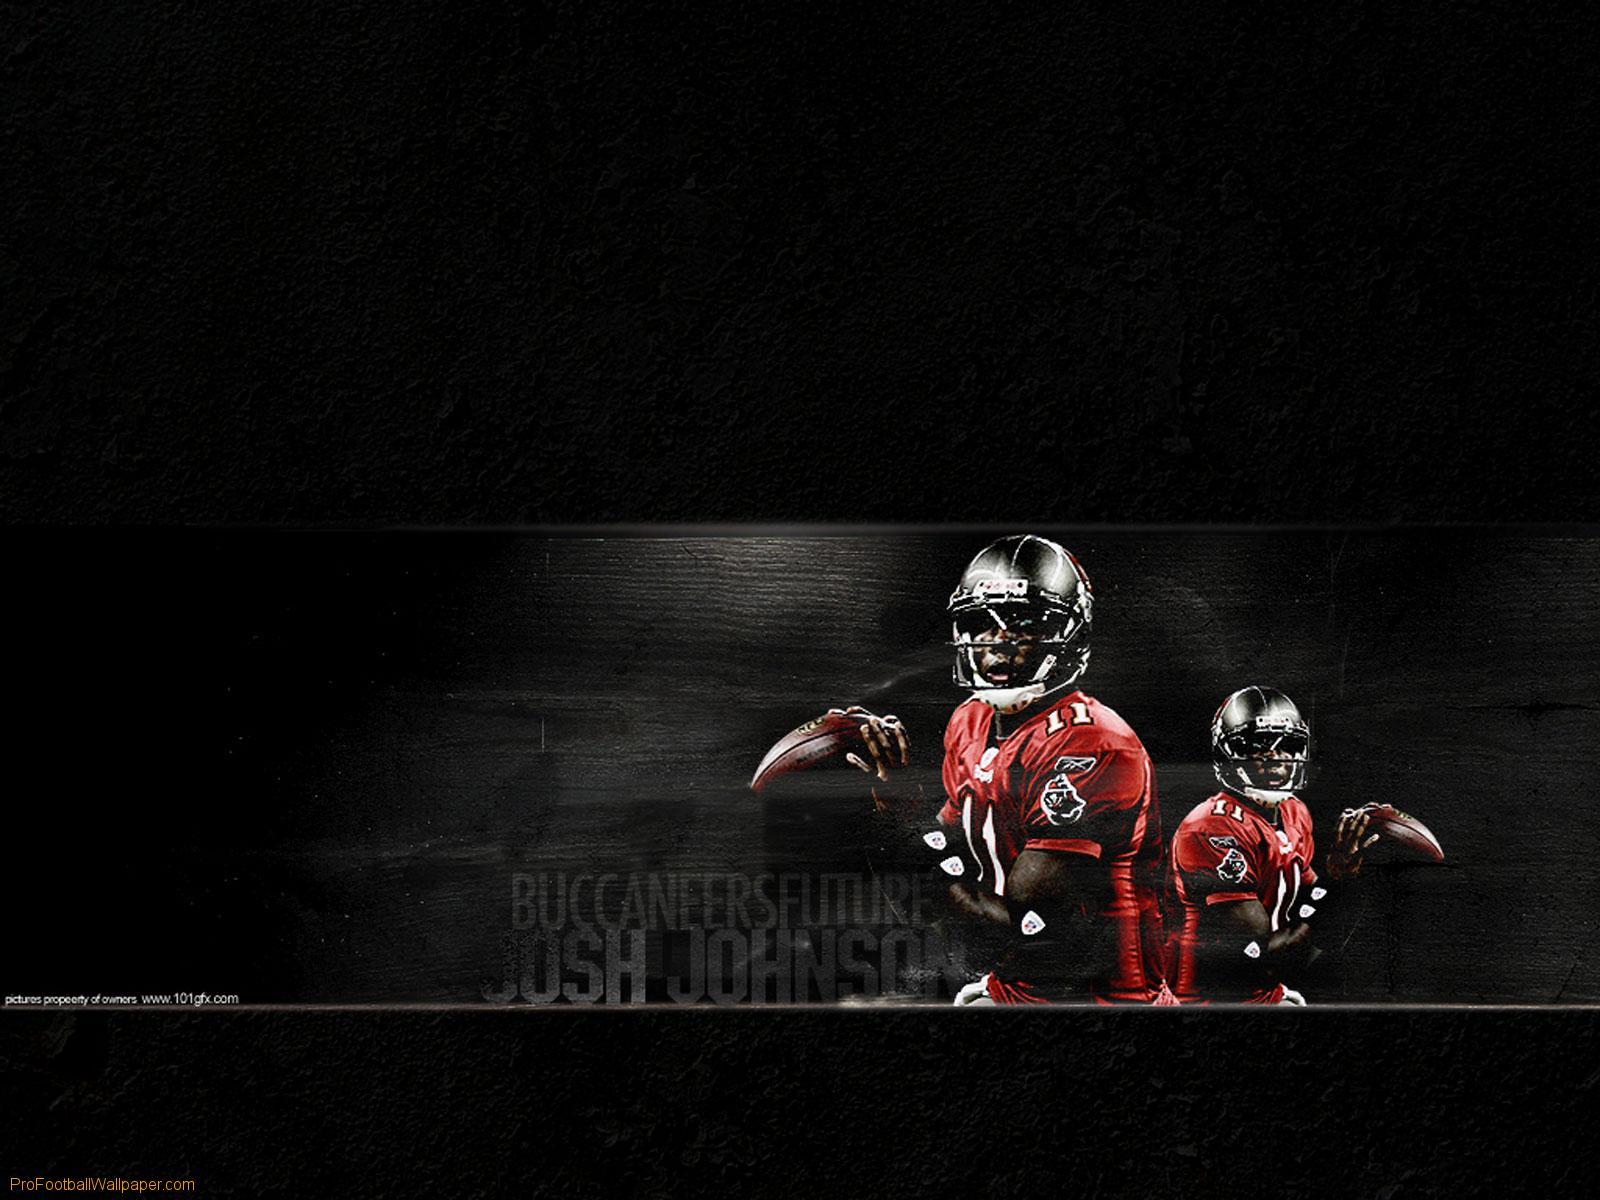 com The Best NFL Team Desktop Wallpapers   FREE 1600x1200